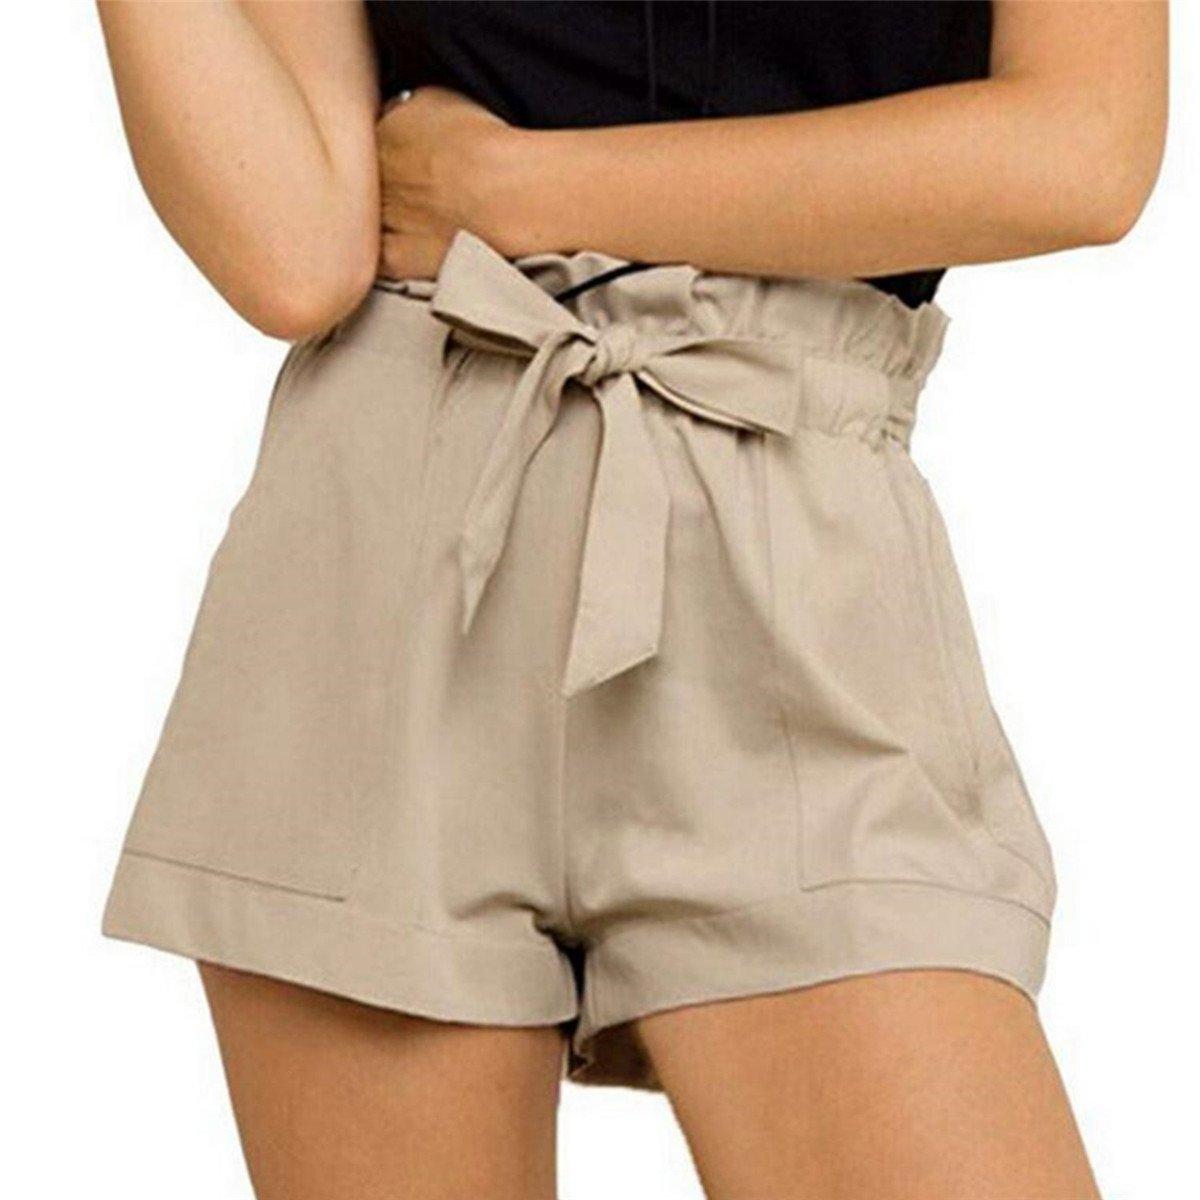 Aeneontrue Damen Shorts Blumen Bedruckte Bandage High Waist Hot Pants Sexy  Sommer Strand Kurzschluss Kurz Hosen Sporthosen Yoga Mini Shorts Lässig ... 908feca56a